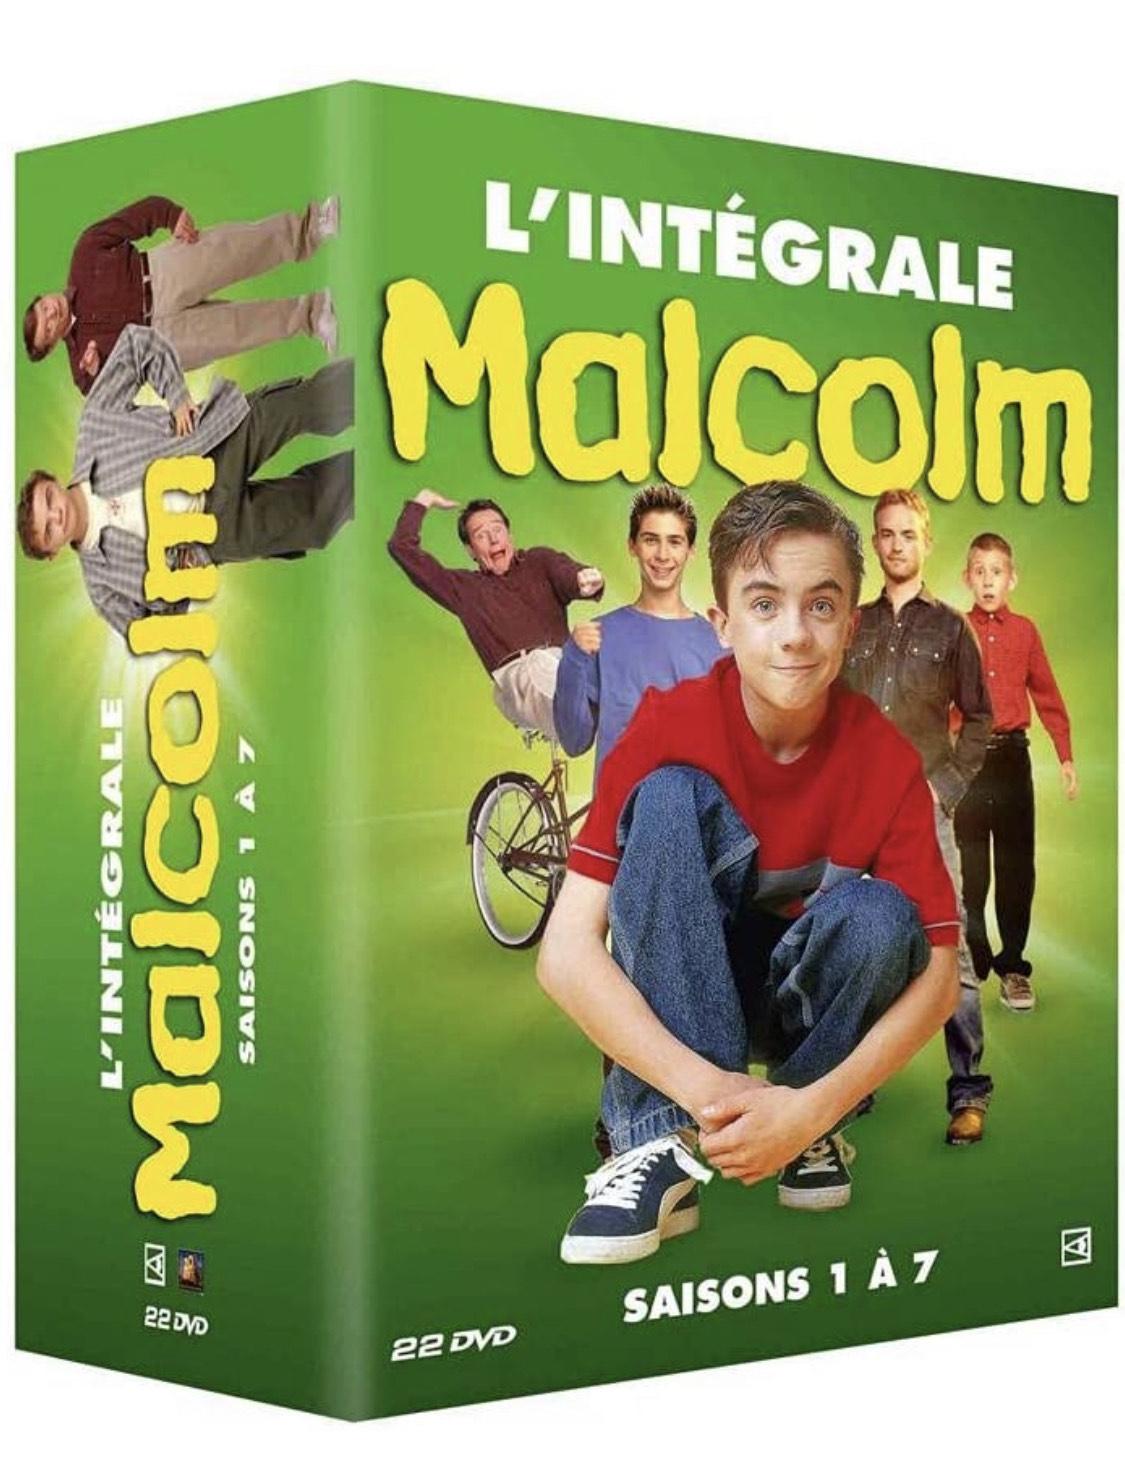 [Prime] Coffret DVD : Malcolm l'intégrale 7 saisons